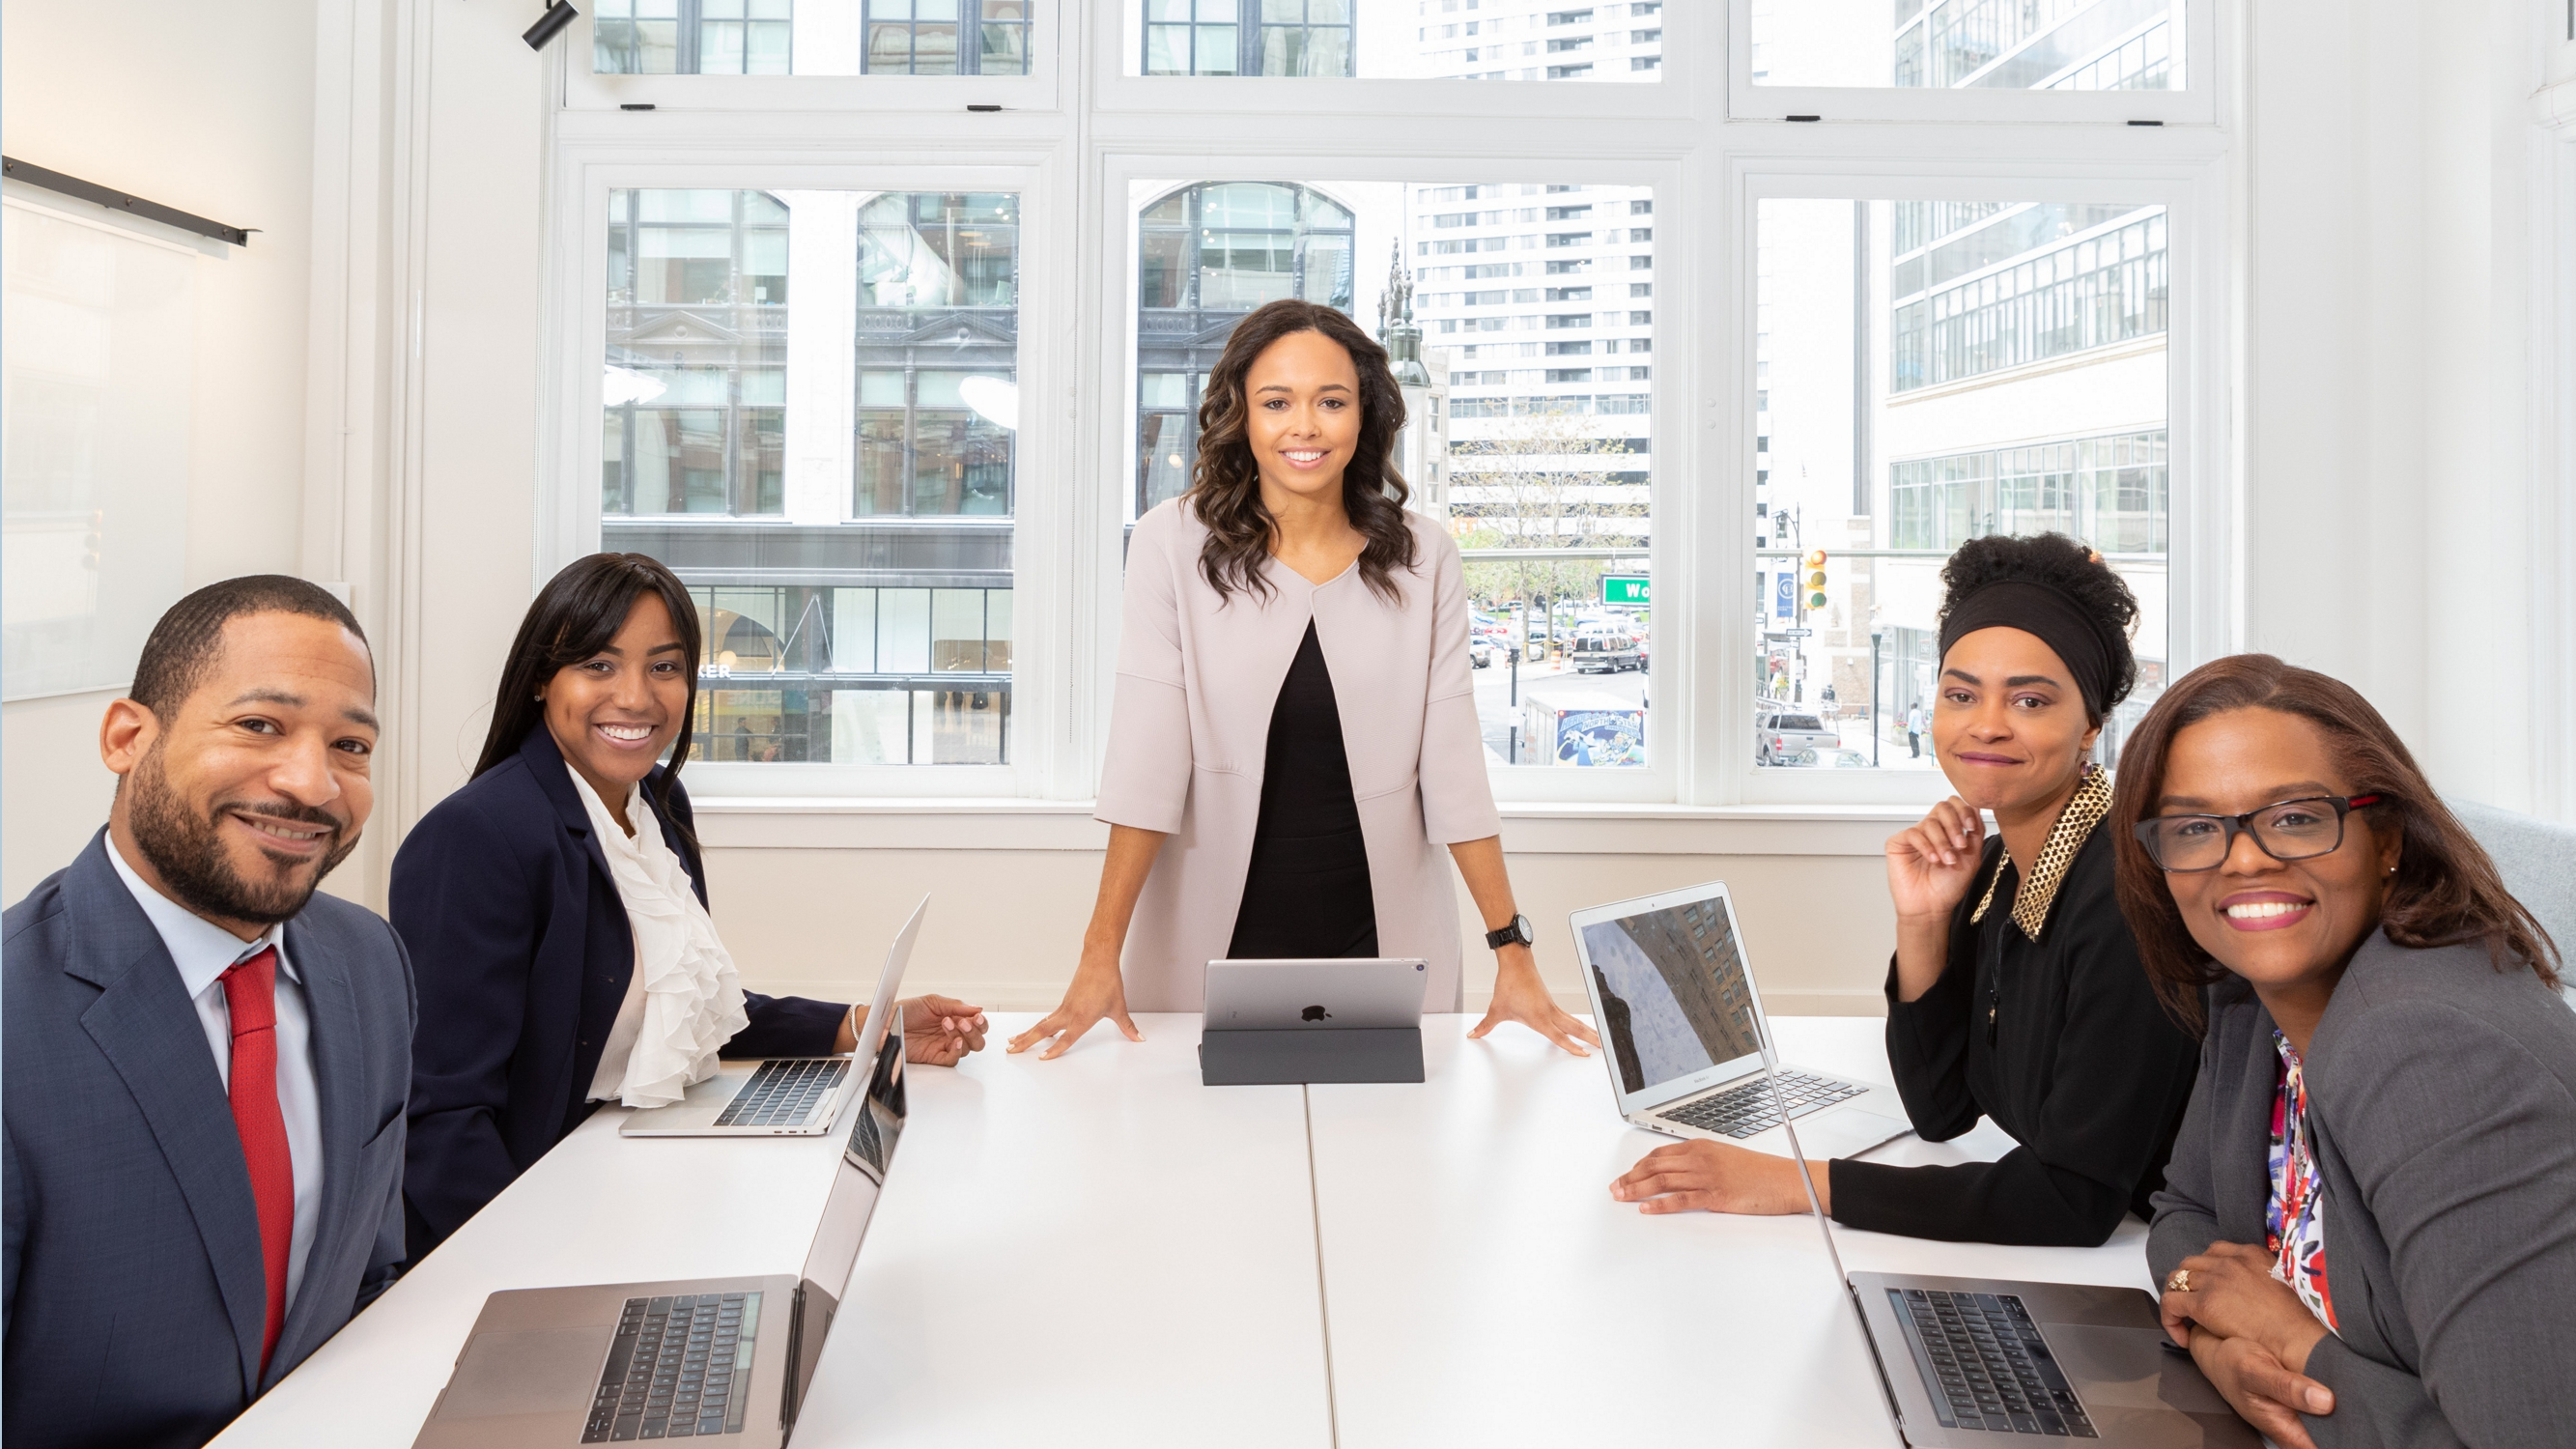 Leadership Development: Where to Start?